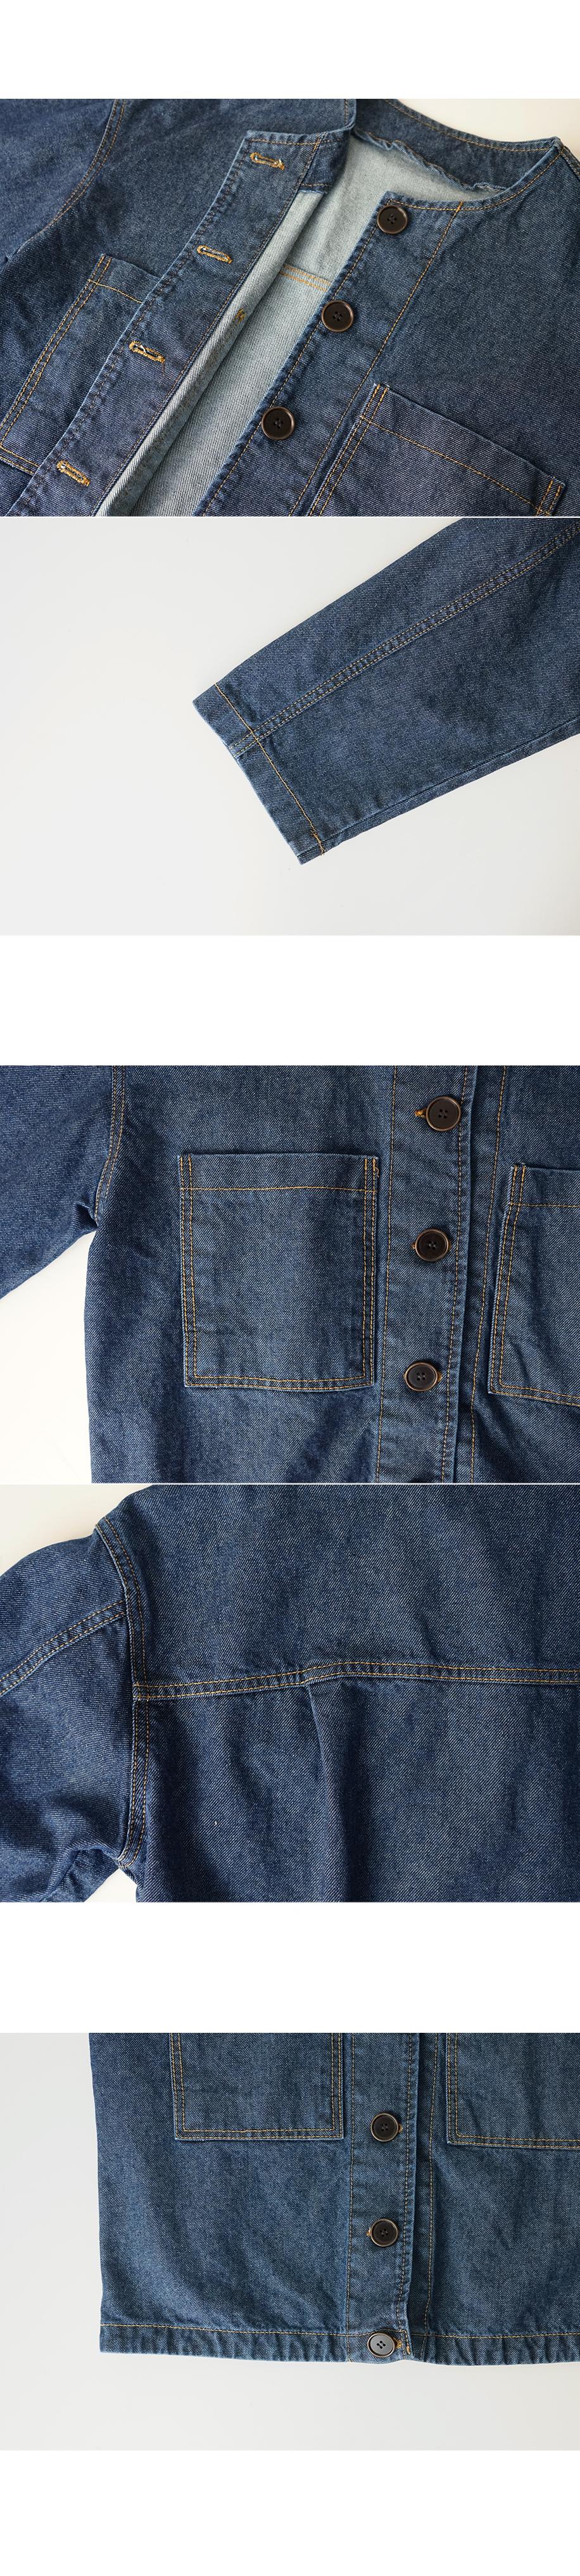 non collar pocket denim jacket